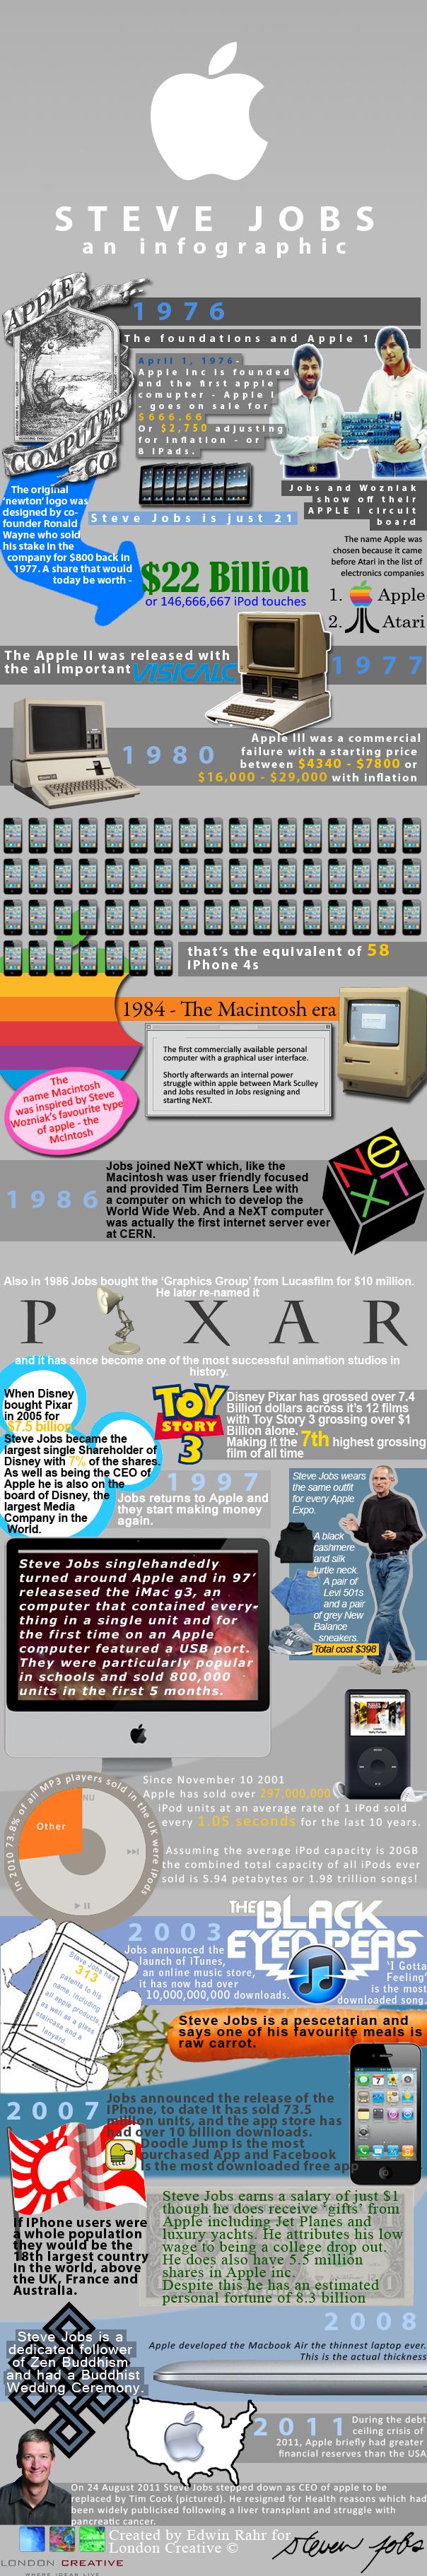 Steve Jobs infographic by London Creative Digital